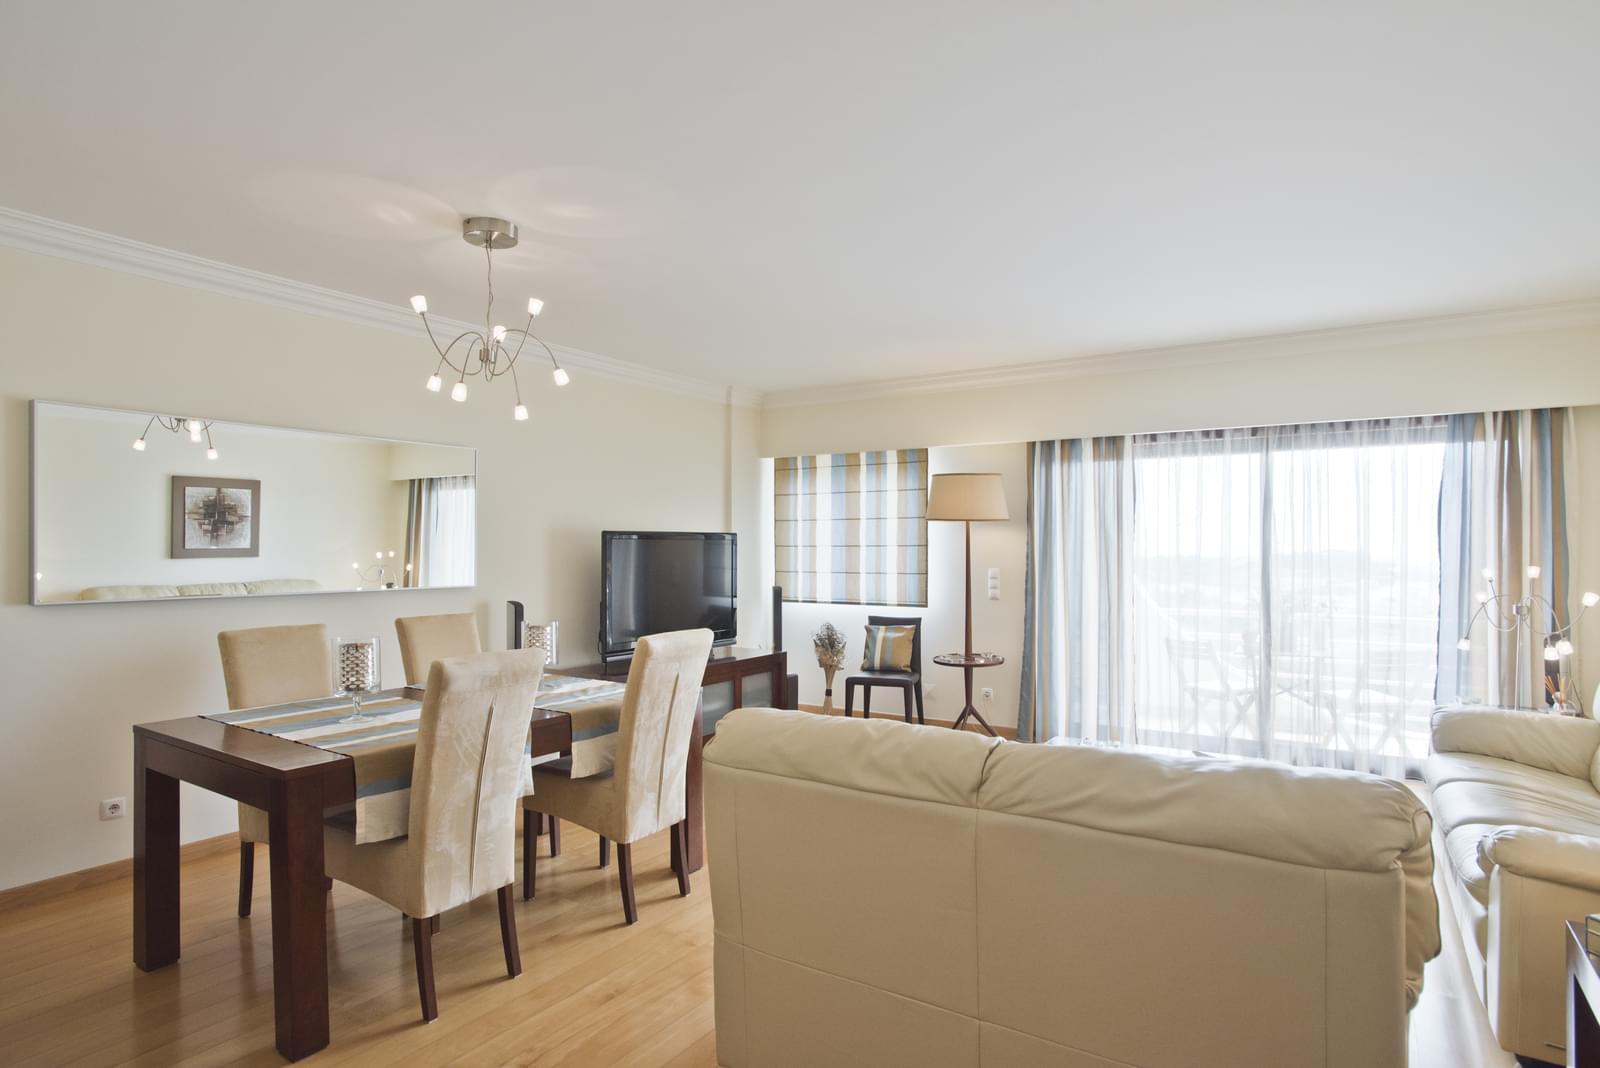 pf17004-apartamento-t3-cascais-c71f7a72-b9f4-4261-9581-a15f33b84a37